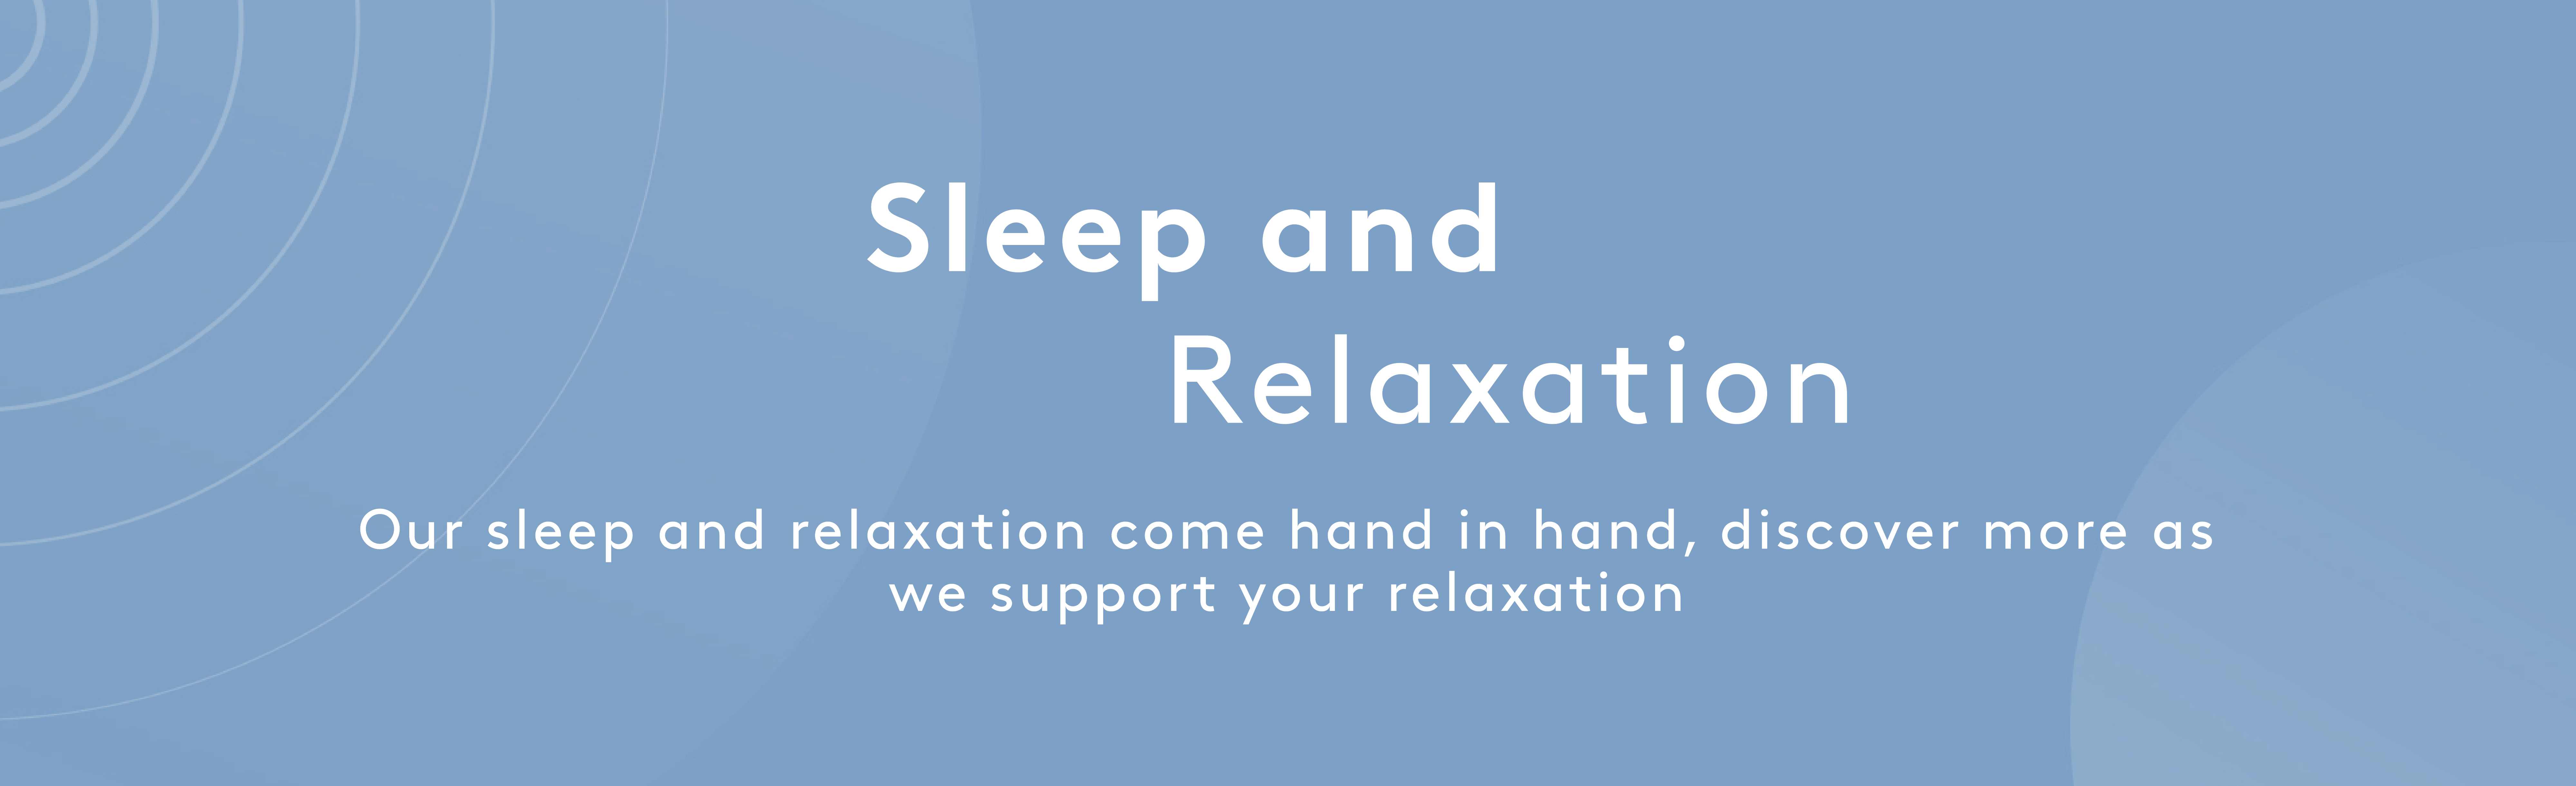 Sleep & Relaxation | Myvitamins